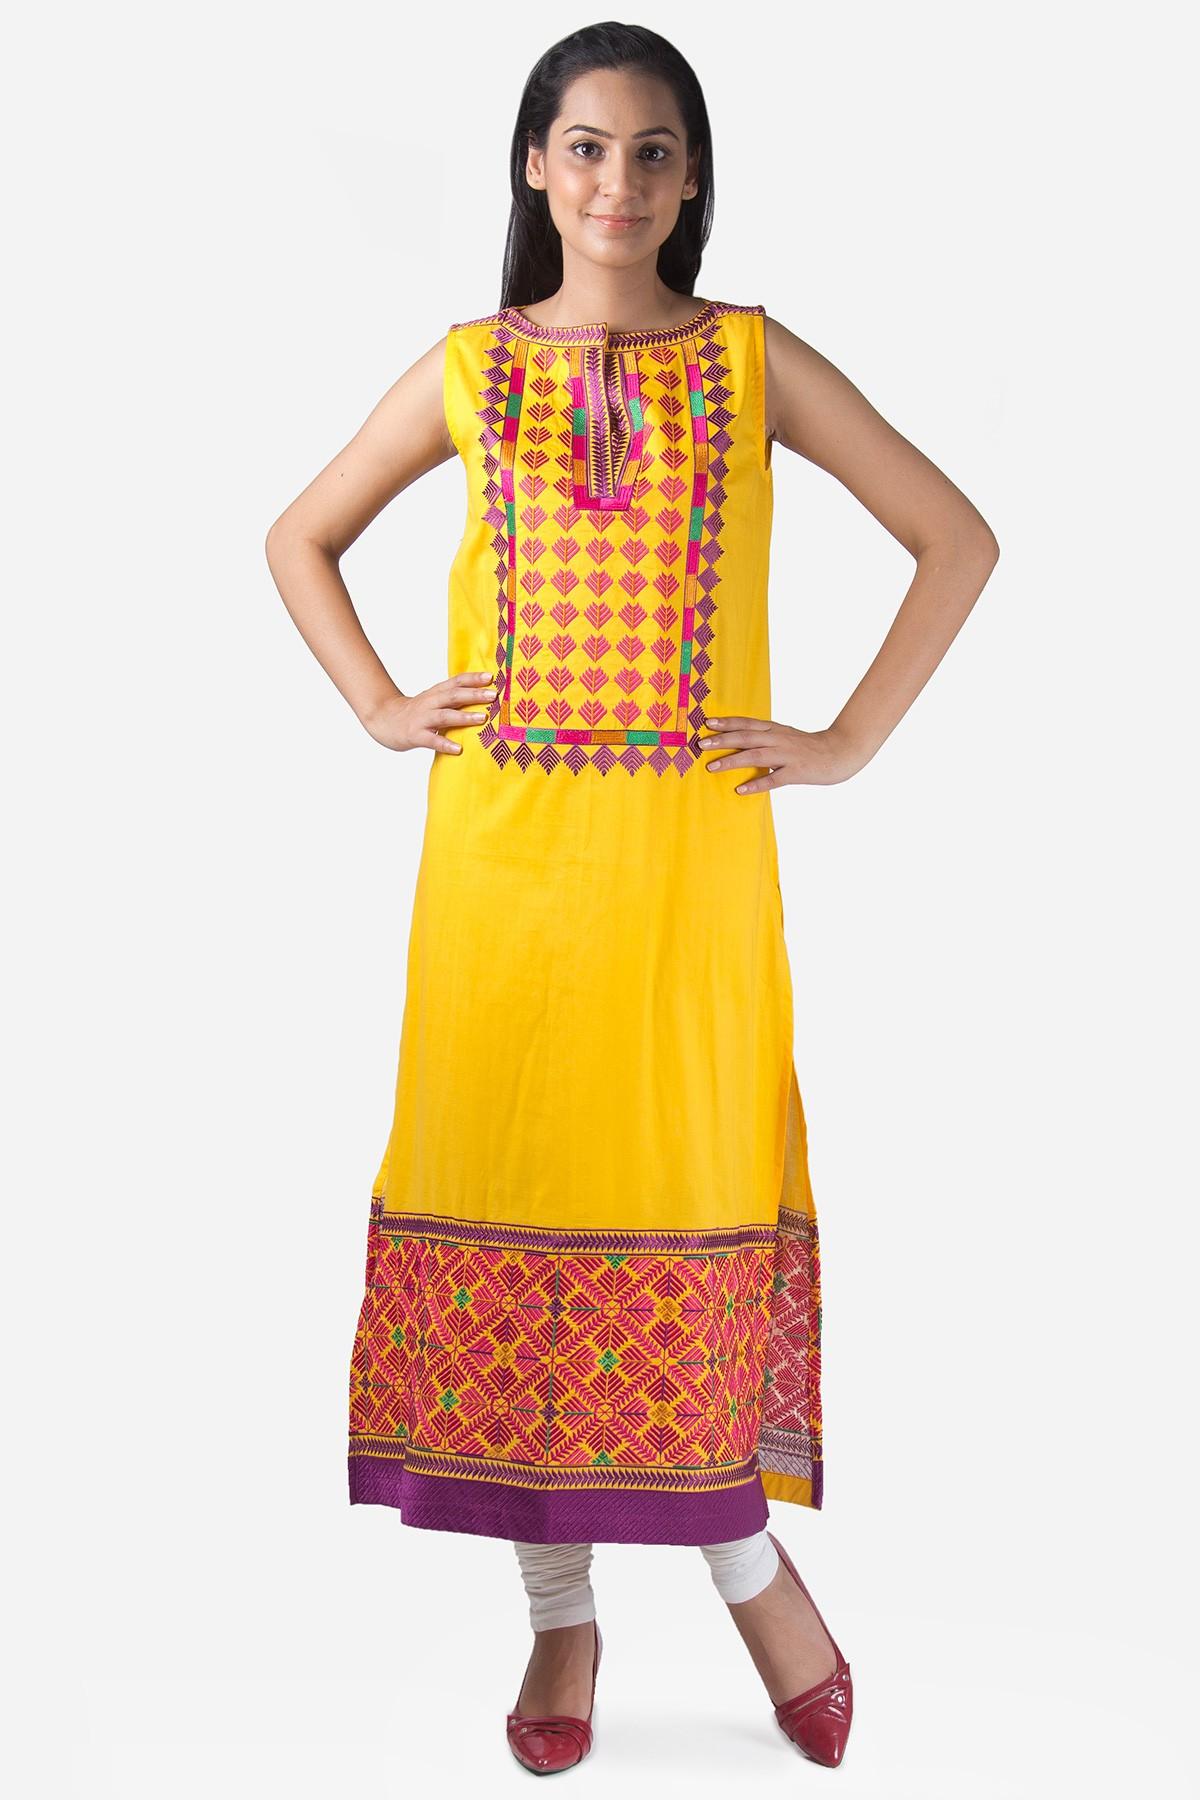 khaadi-kurta-prices-2014